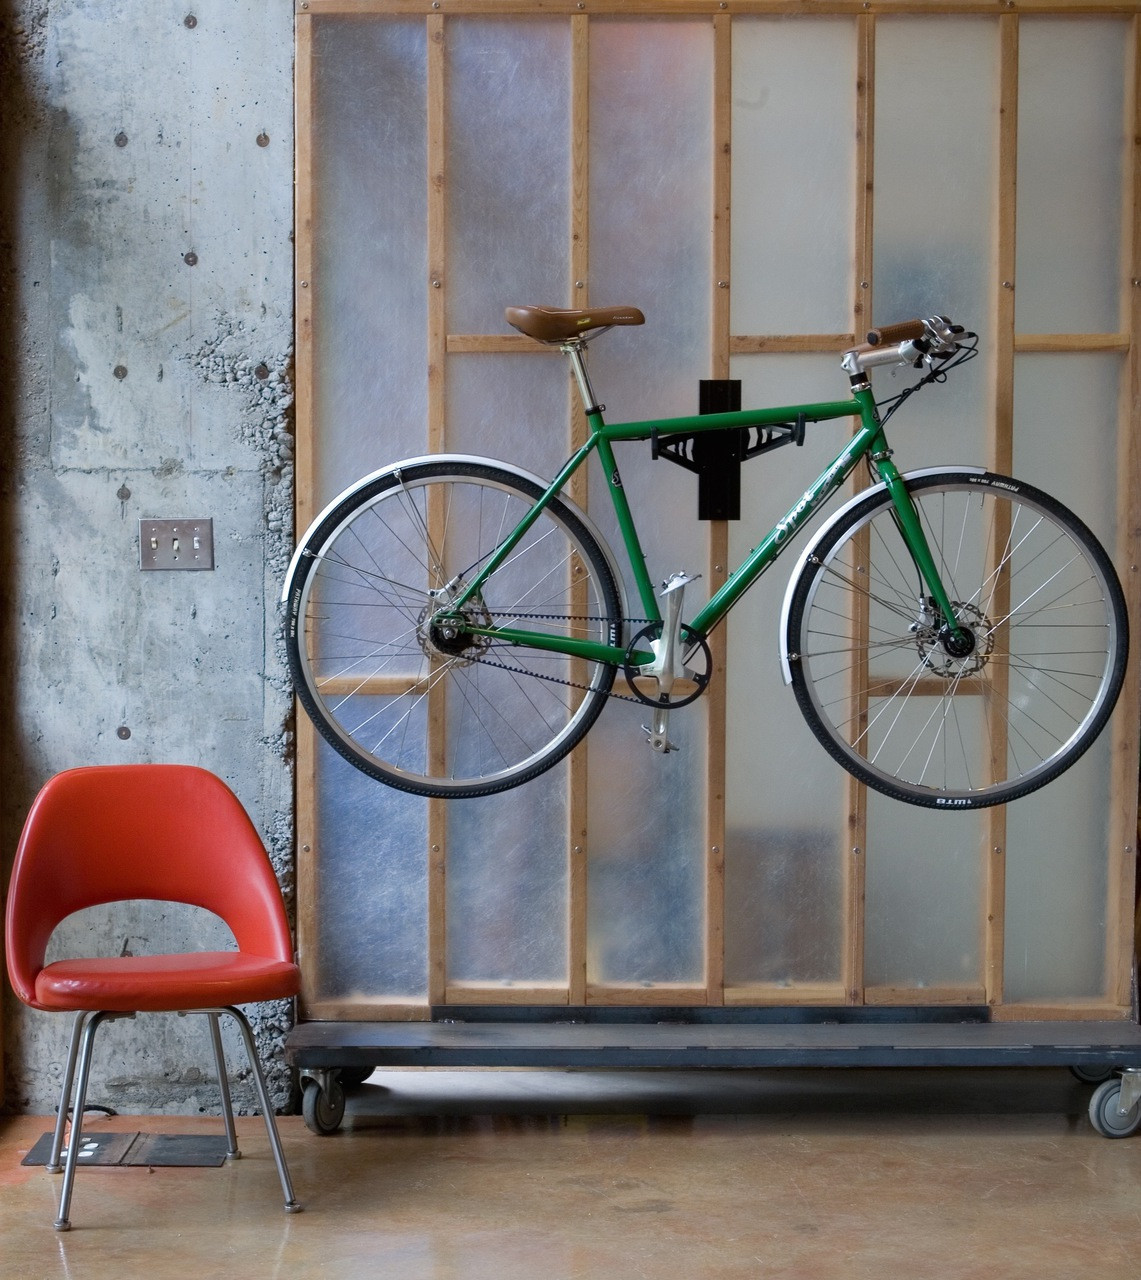 wall storage rack for bikes & Steel Bike Wall Rack | Bike Storage and Display - StoreYourBoard.com